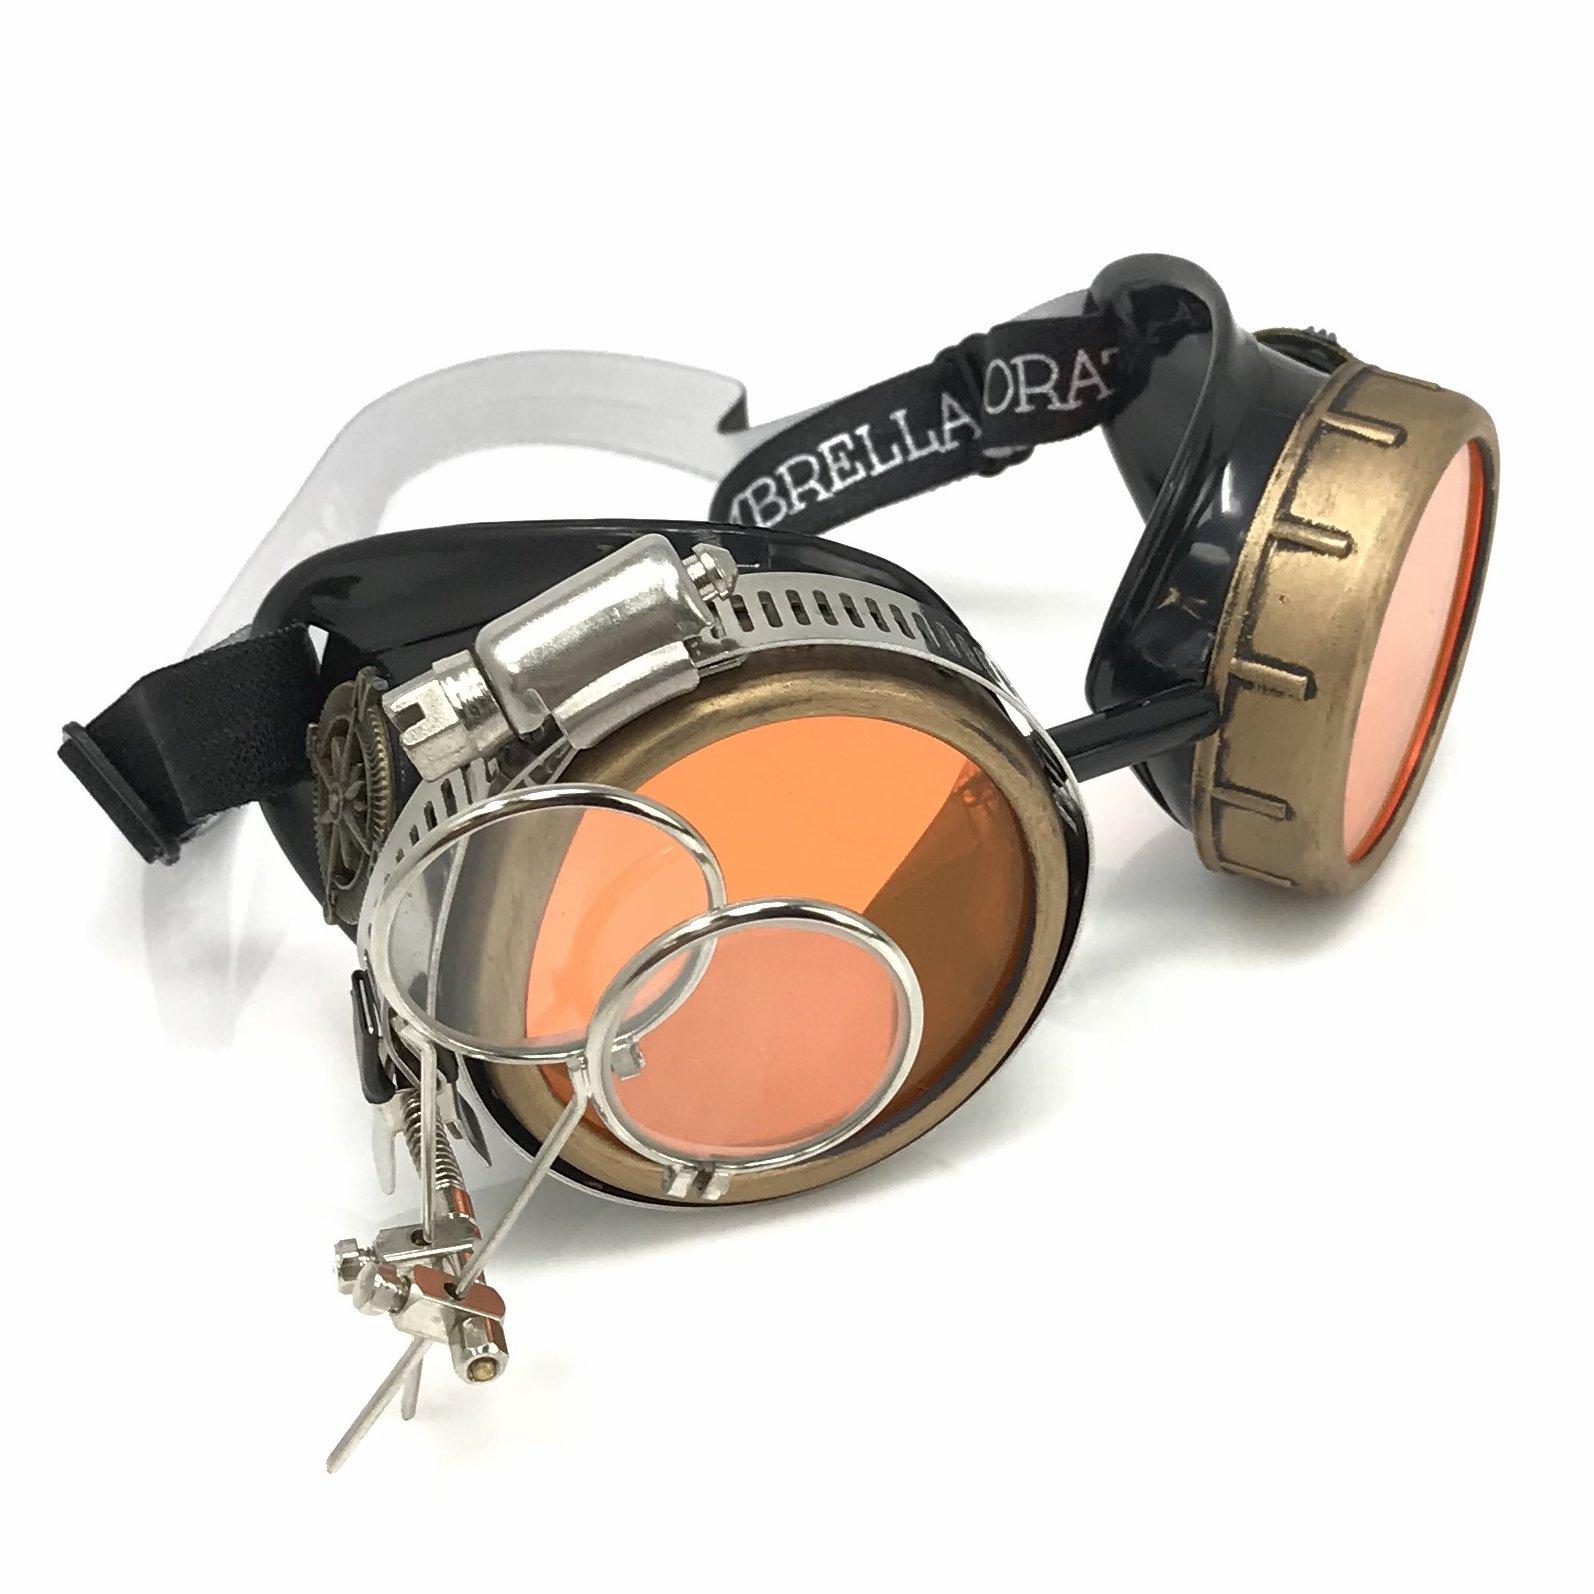 UMBRELLALABORATORY Steampunk Victorian Style Goggles with Compass Design, Neon Orange Lenses & Ocular Loupe